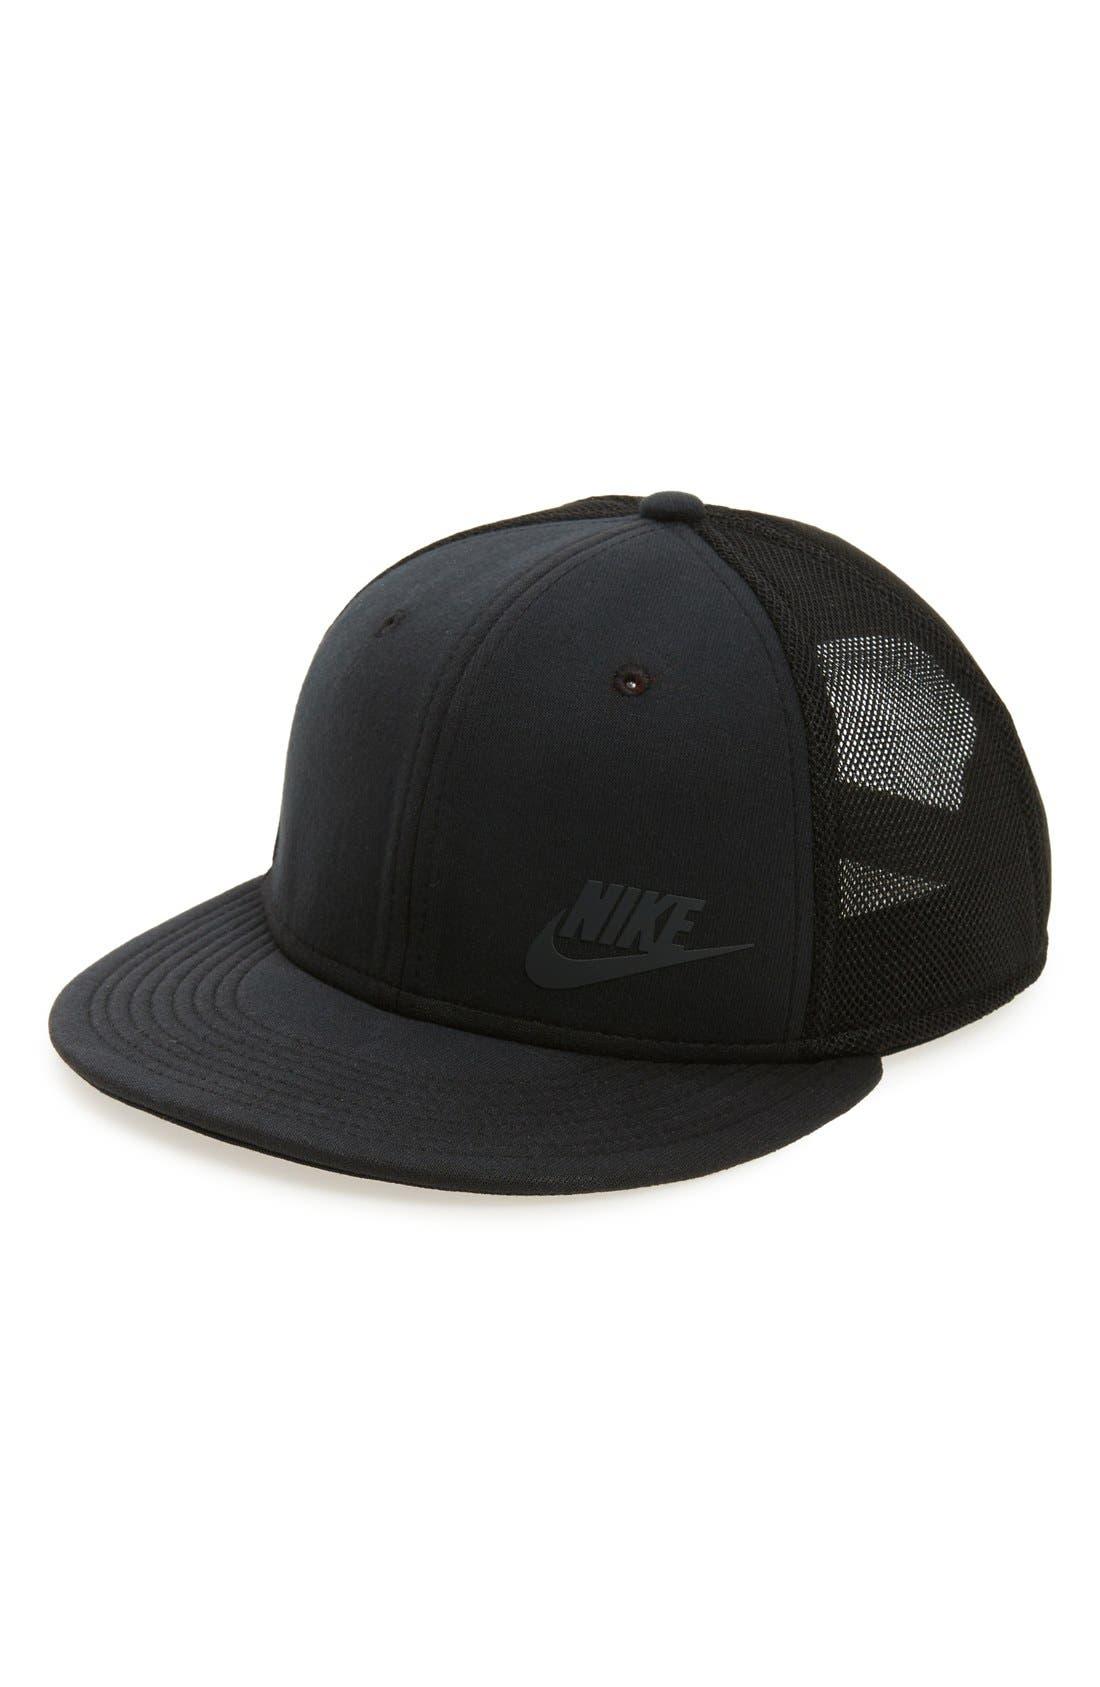 Alternate Image 1 Selected - Nike 'Tech Pack' Trucker Hat